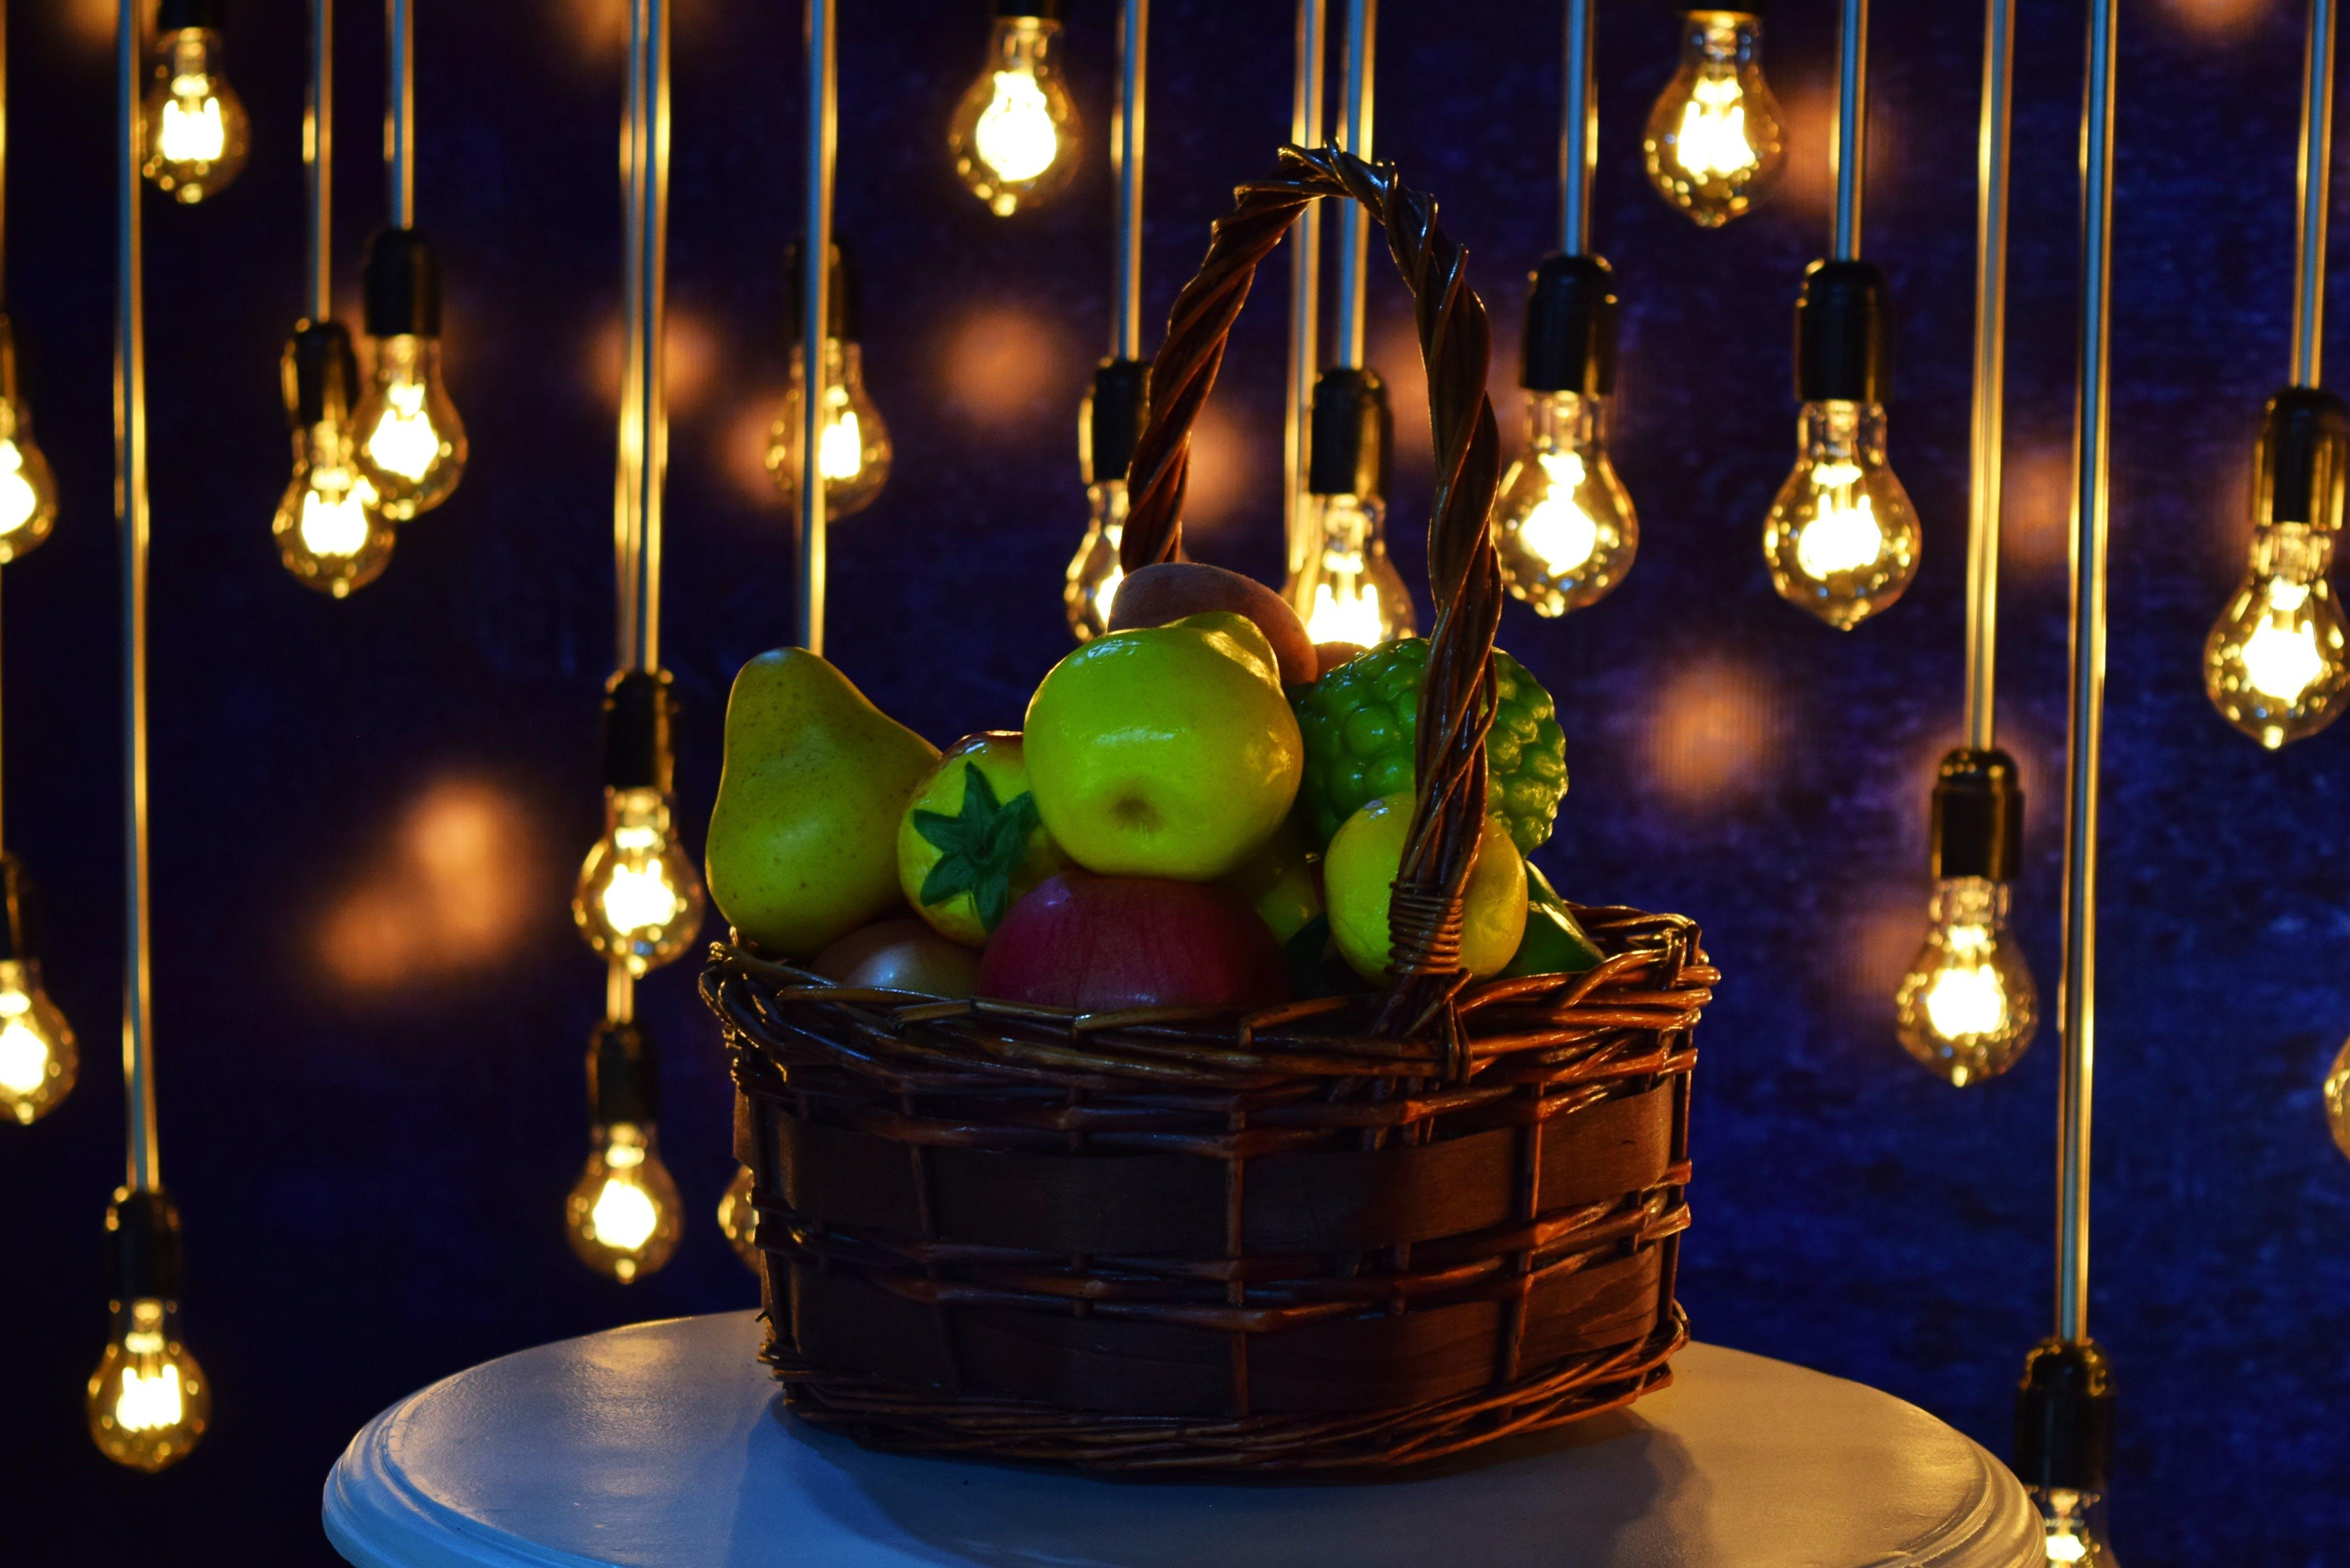 Free stock photo of basket, bowl of fruit, bucket, bulb